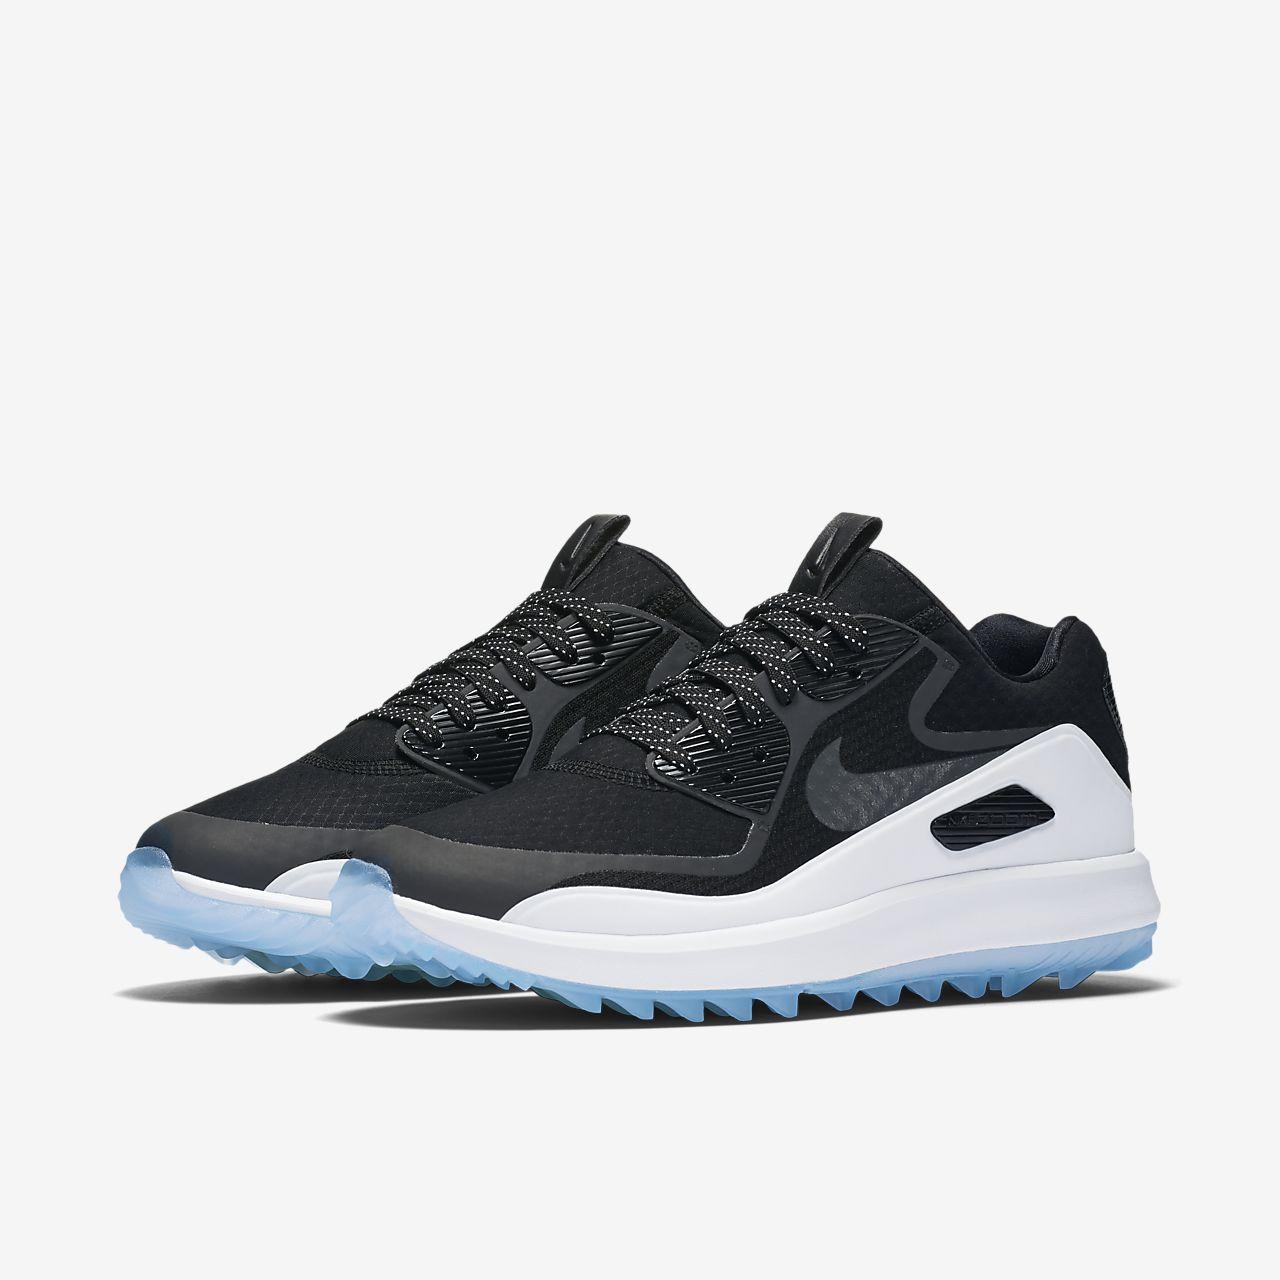 buy online c2ca4 1ef14 Nike Air Zoom 90 IT Women's Golf Shoe